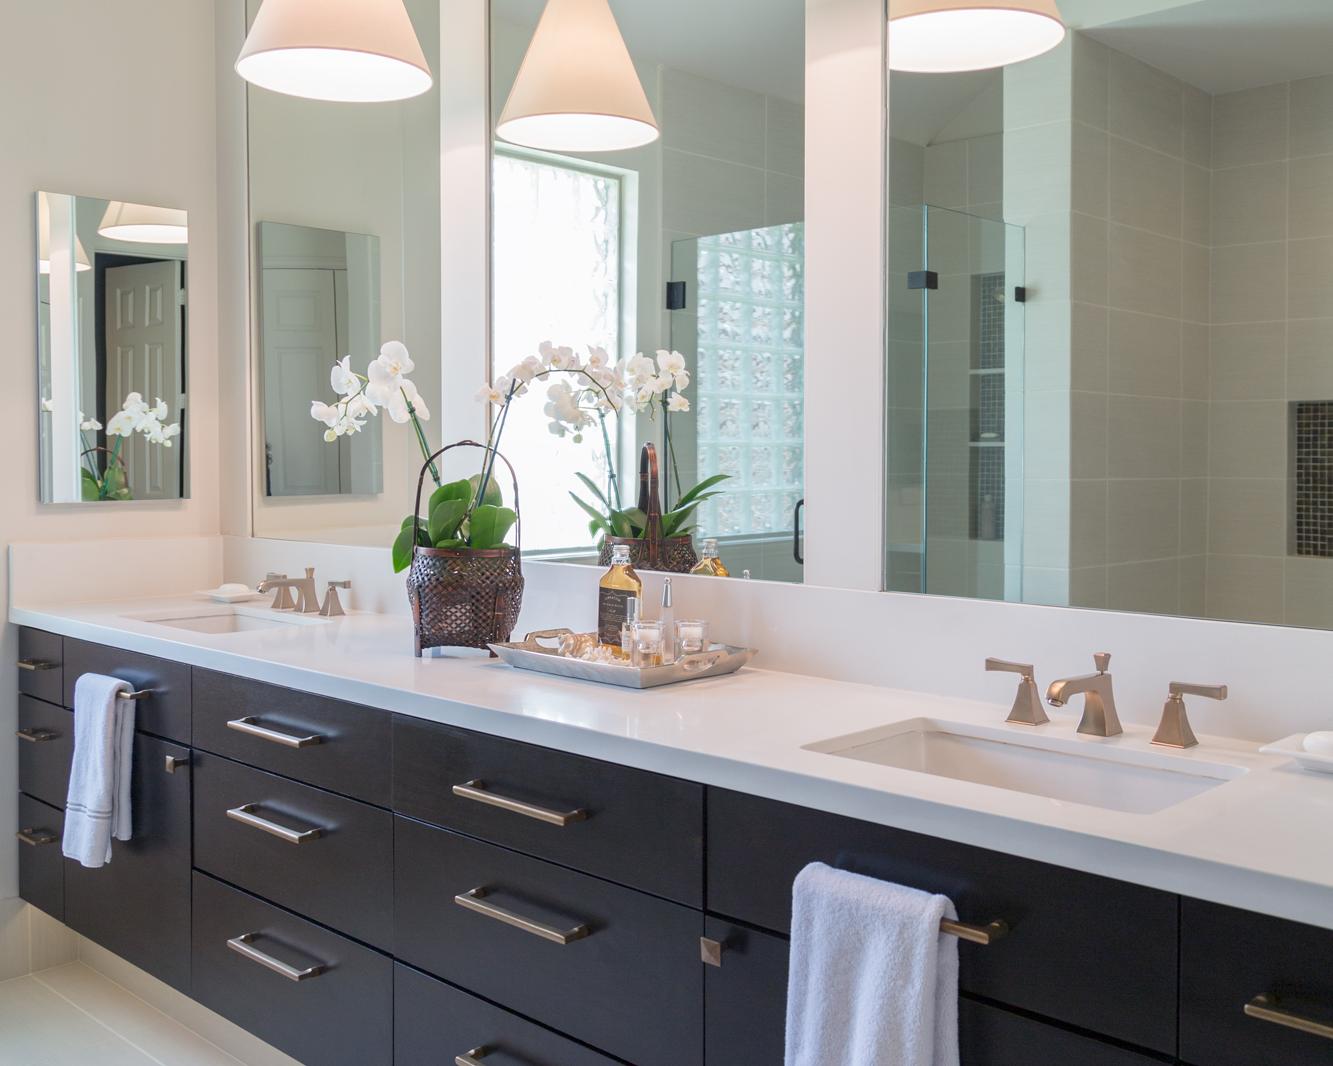 BEFORE & AFTER: A Master Bathroom Remodel Surprises ...